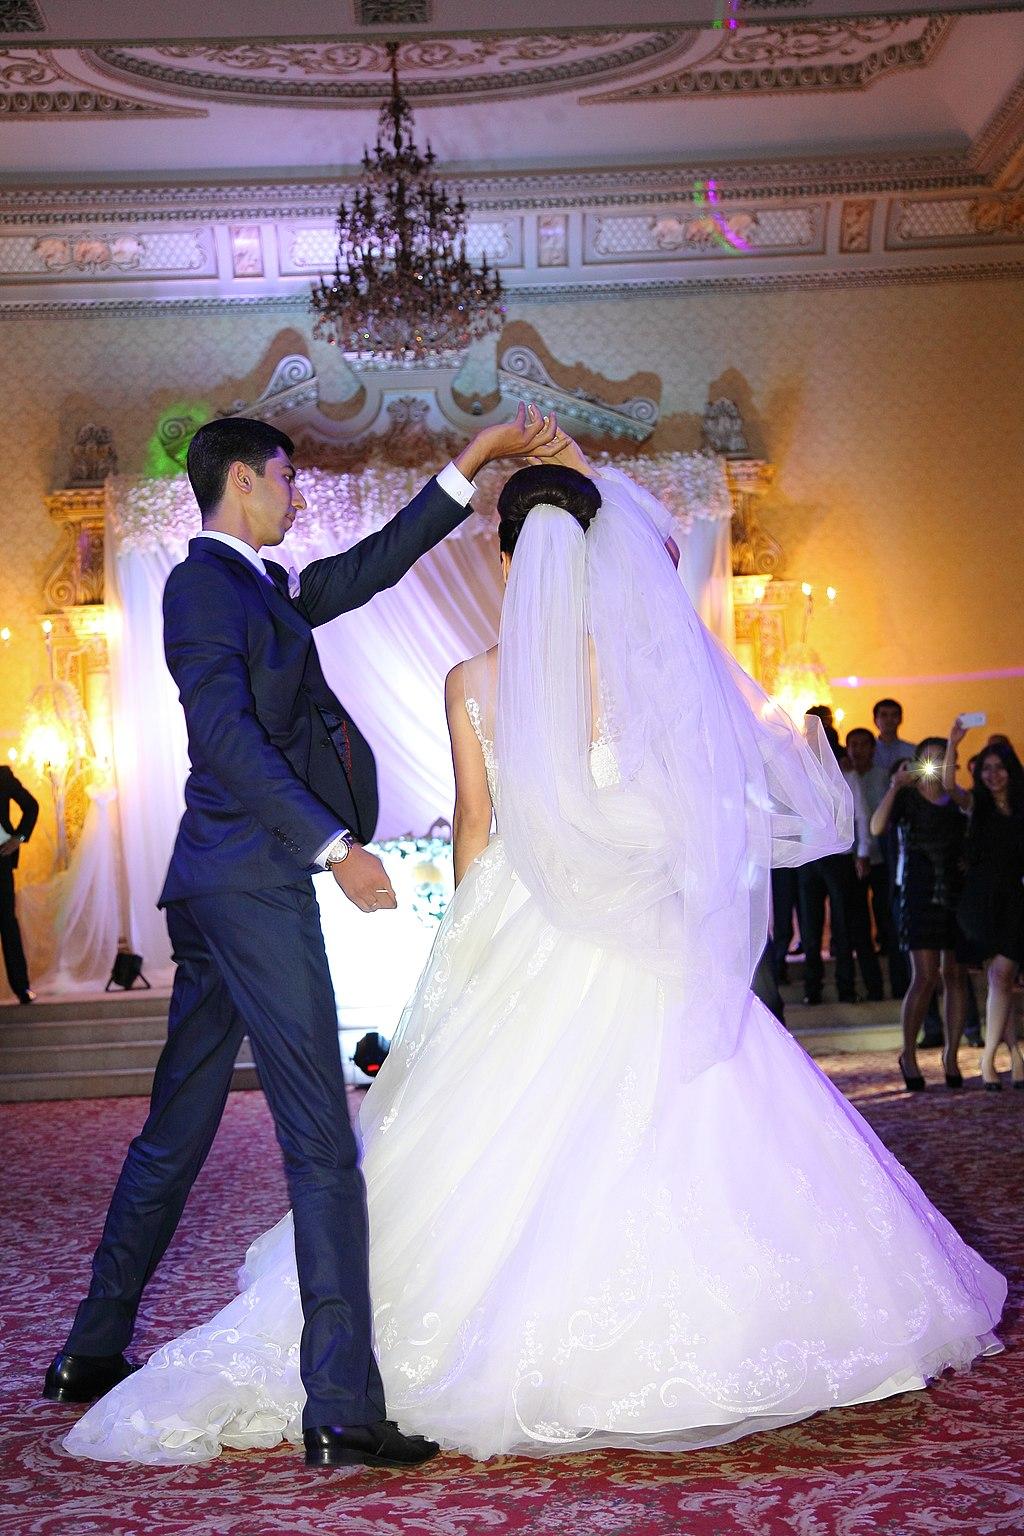 Mariage Ouzbékistan Célébration Loi